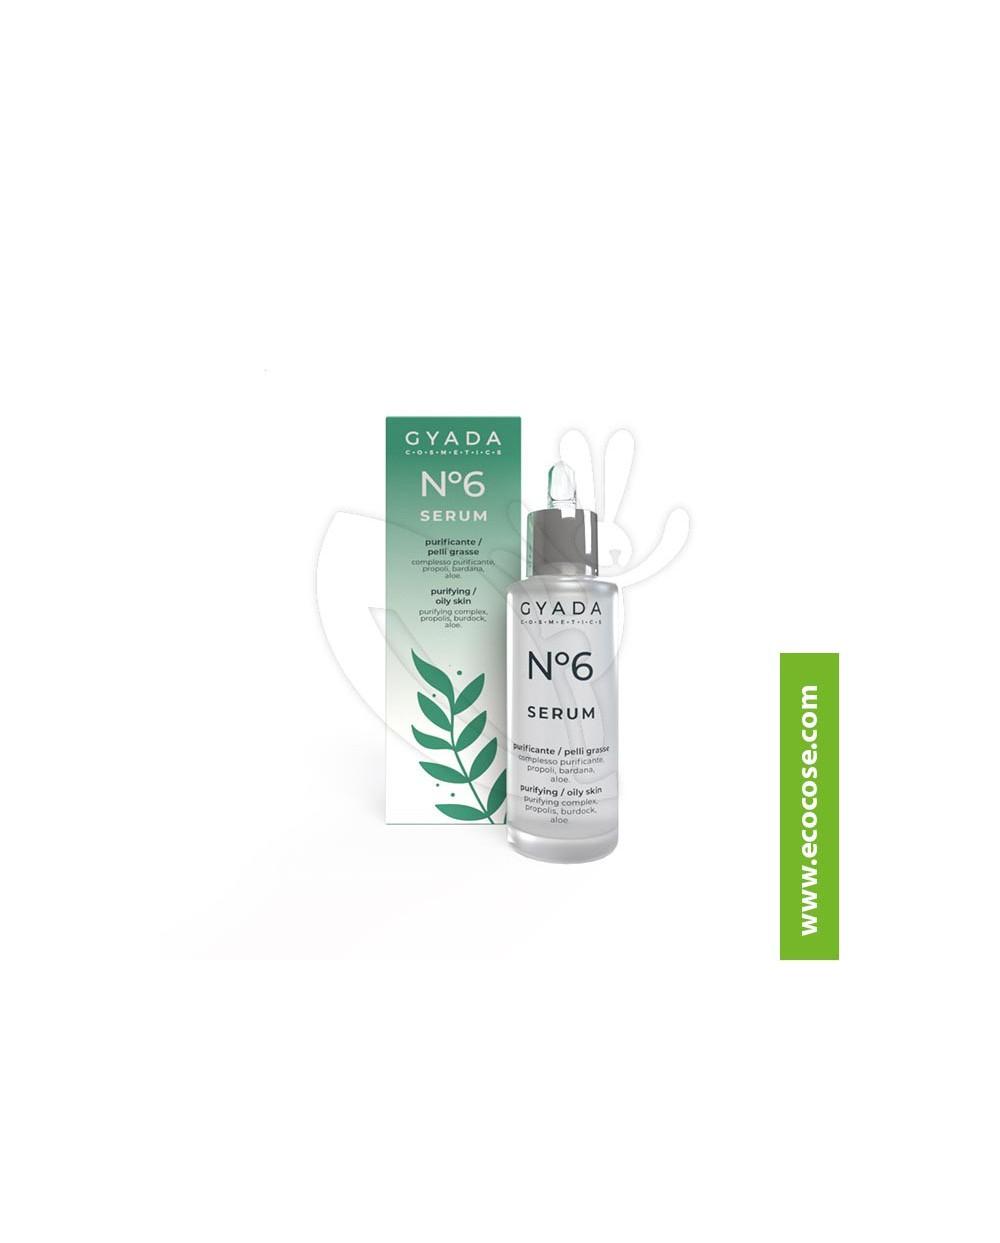 Gyada Cosmetics - Siero Viso N. 6 Purificante pelli grasse